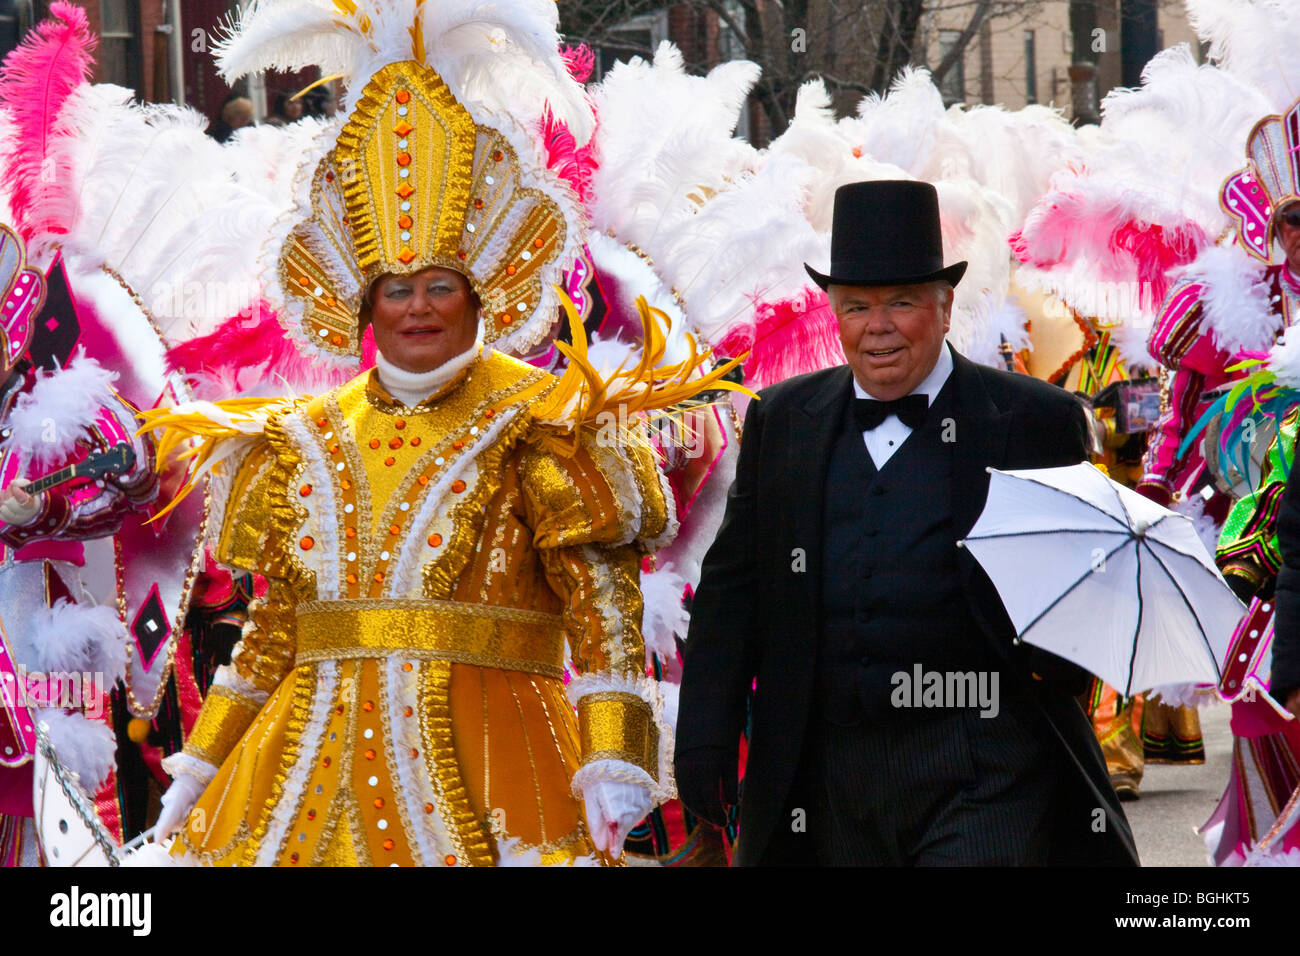 2010 Mummers Parade in Philadelphia, Pennsylvania - Stock Image